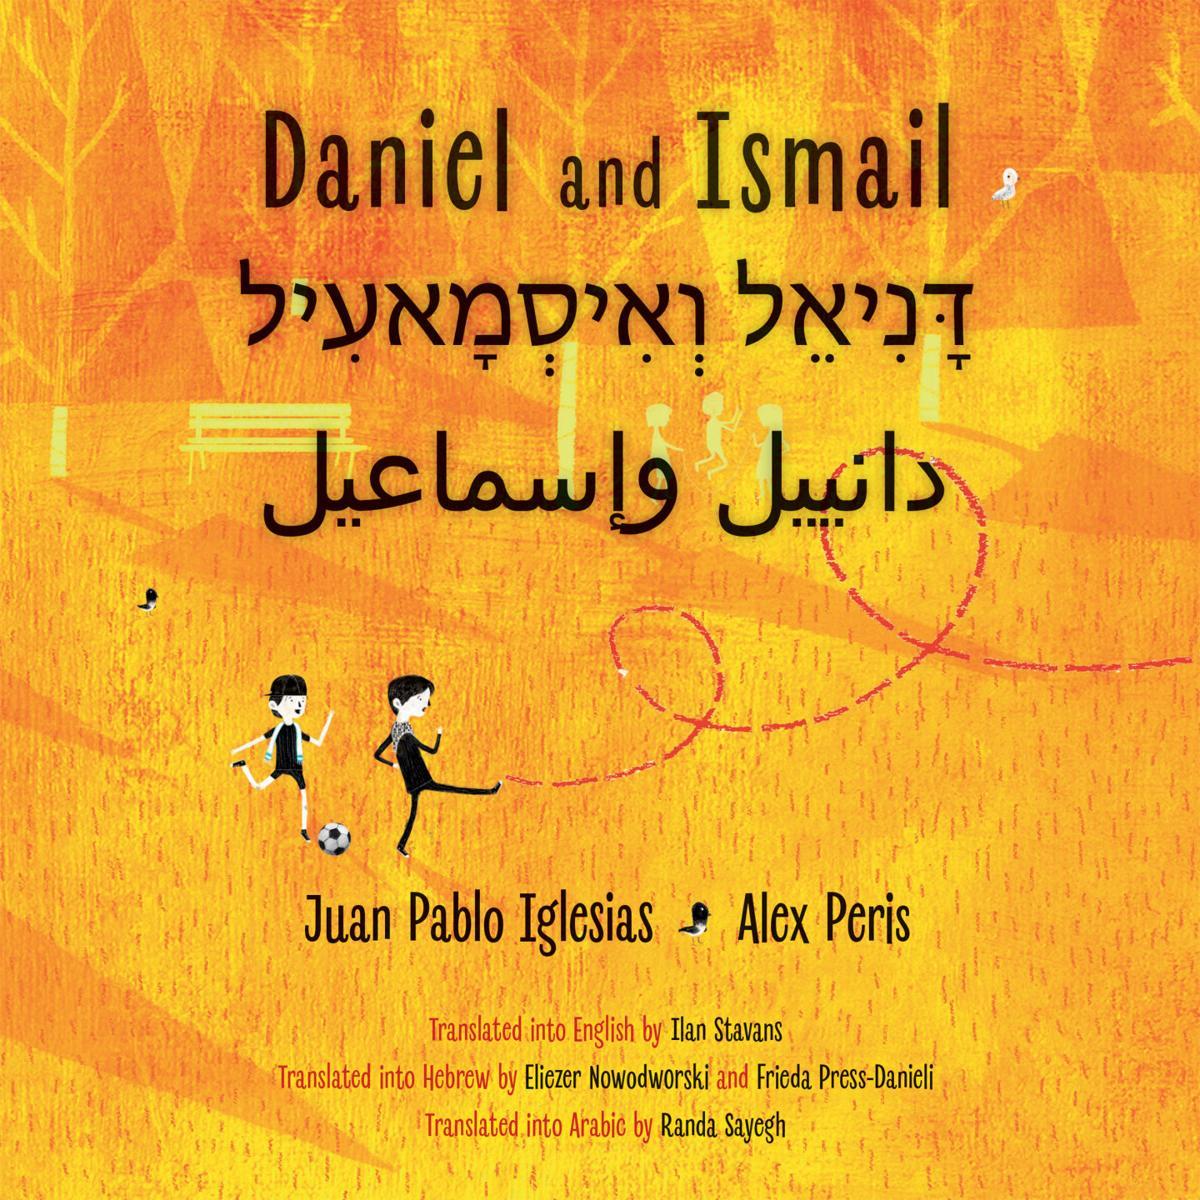 Daniel and Ismail.jpg